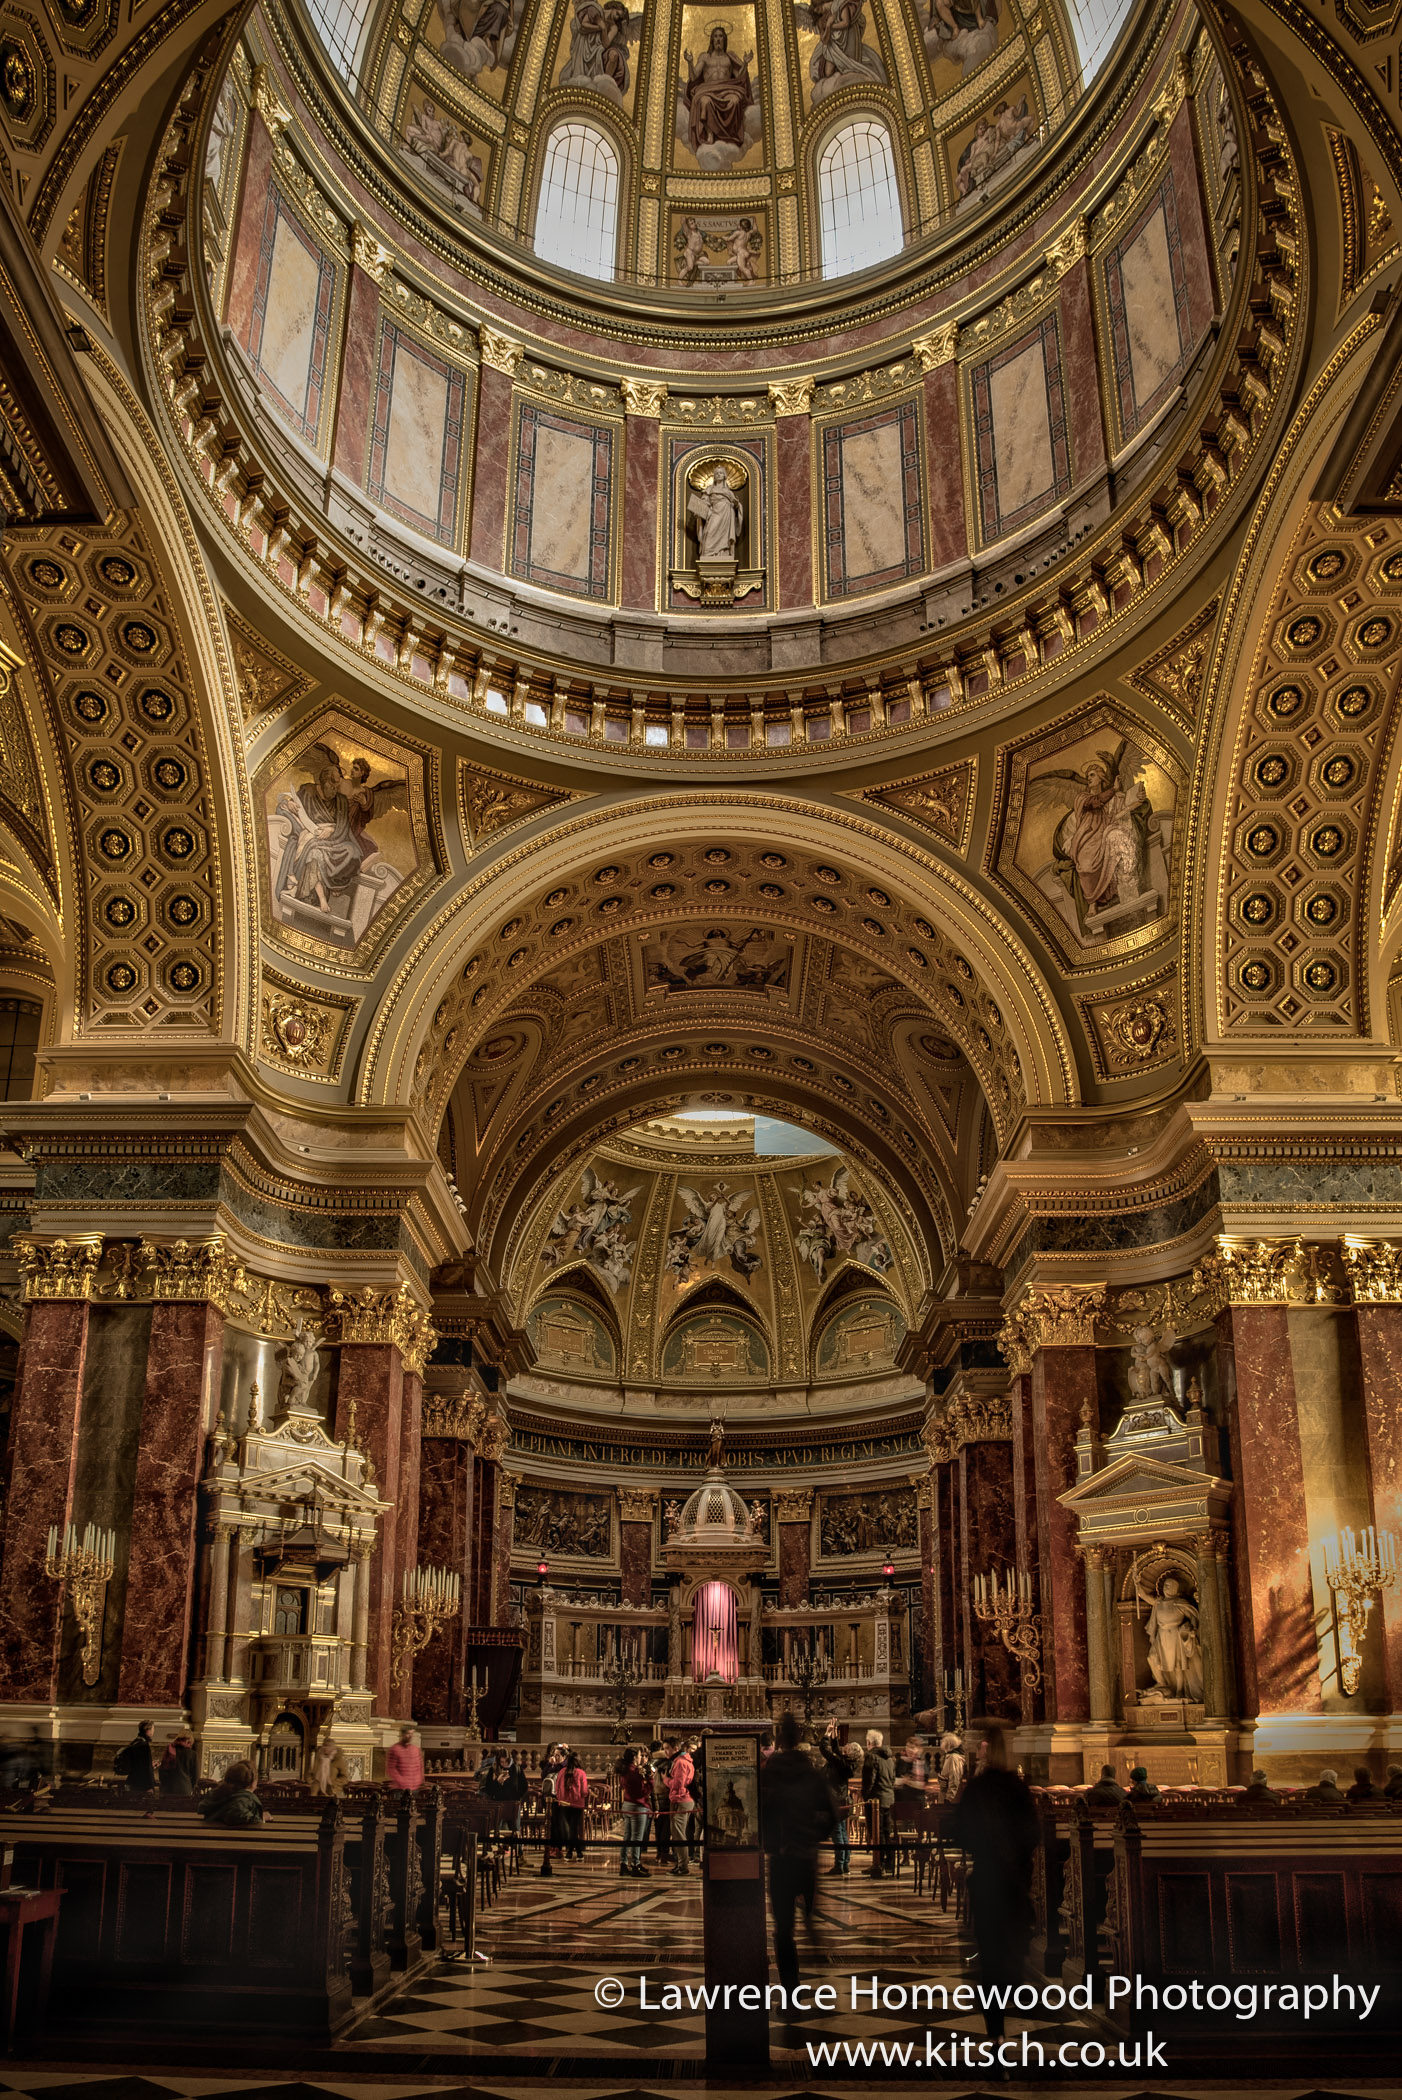 St Stephen's Basilica Interior 3